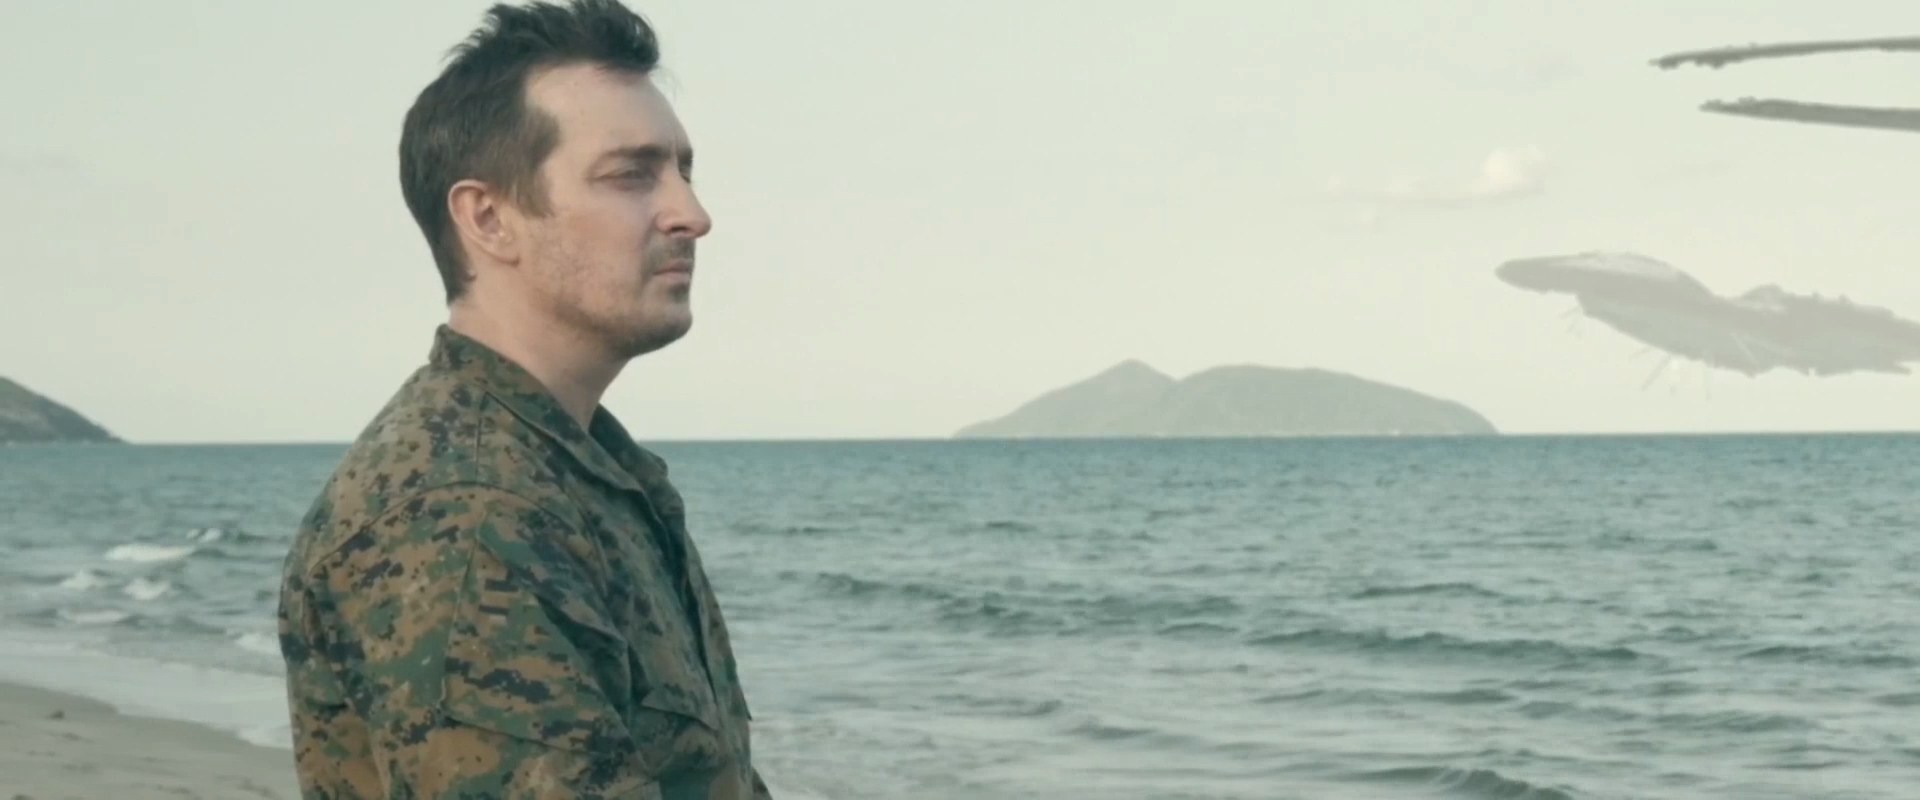 Батальон / Battalion (2018) WEB-DLRip 1080p